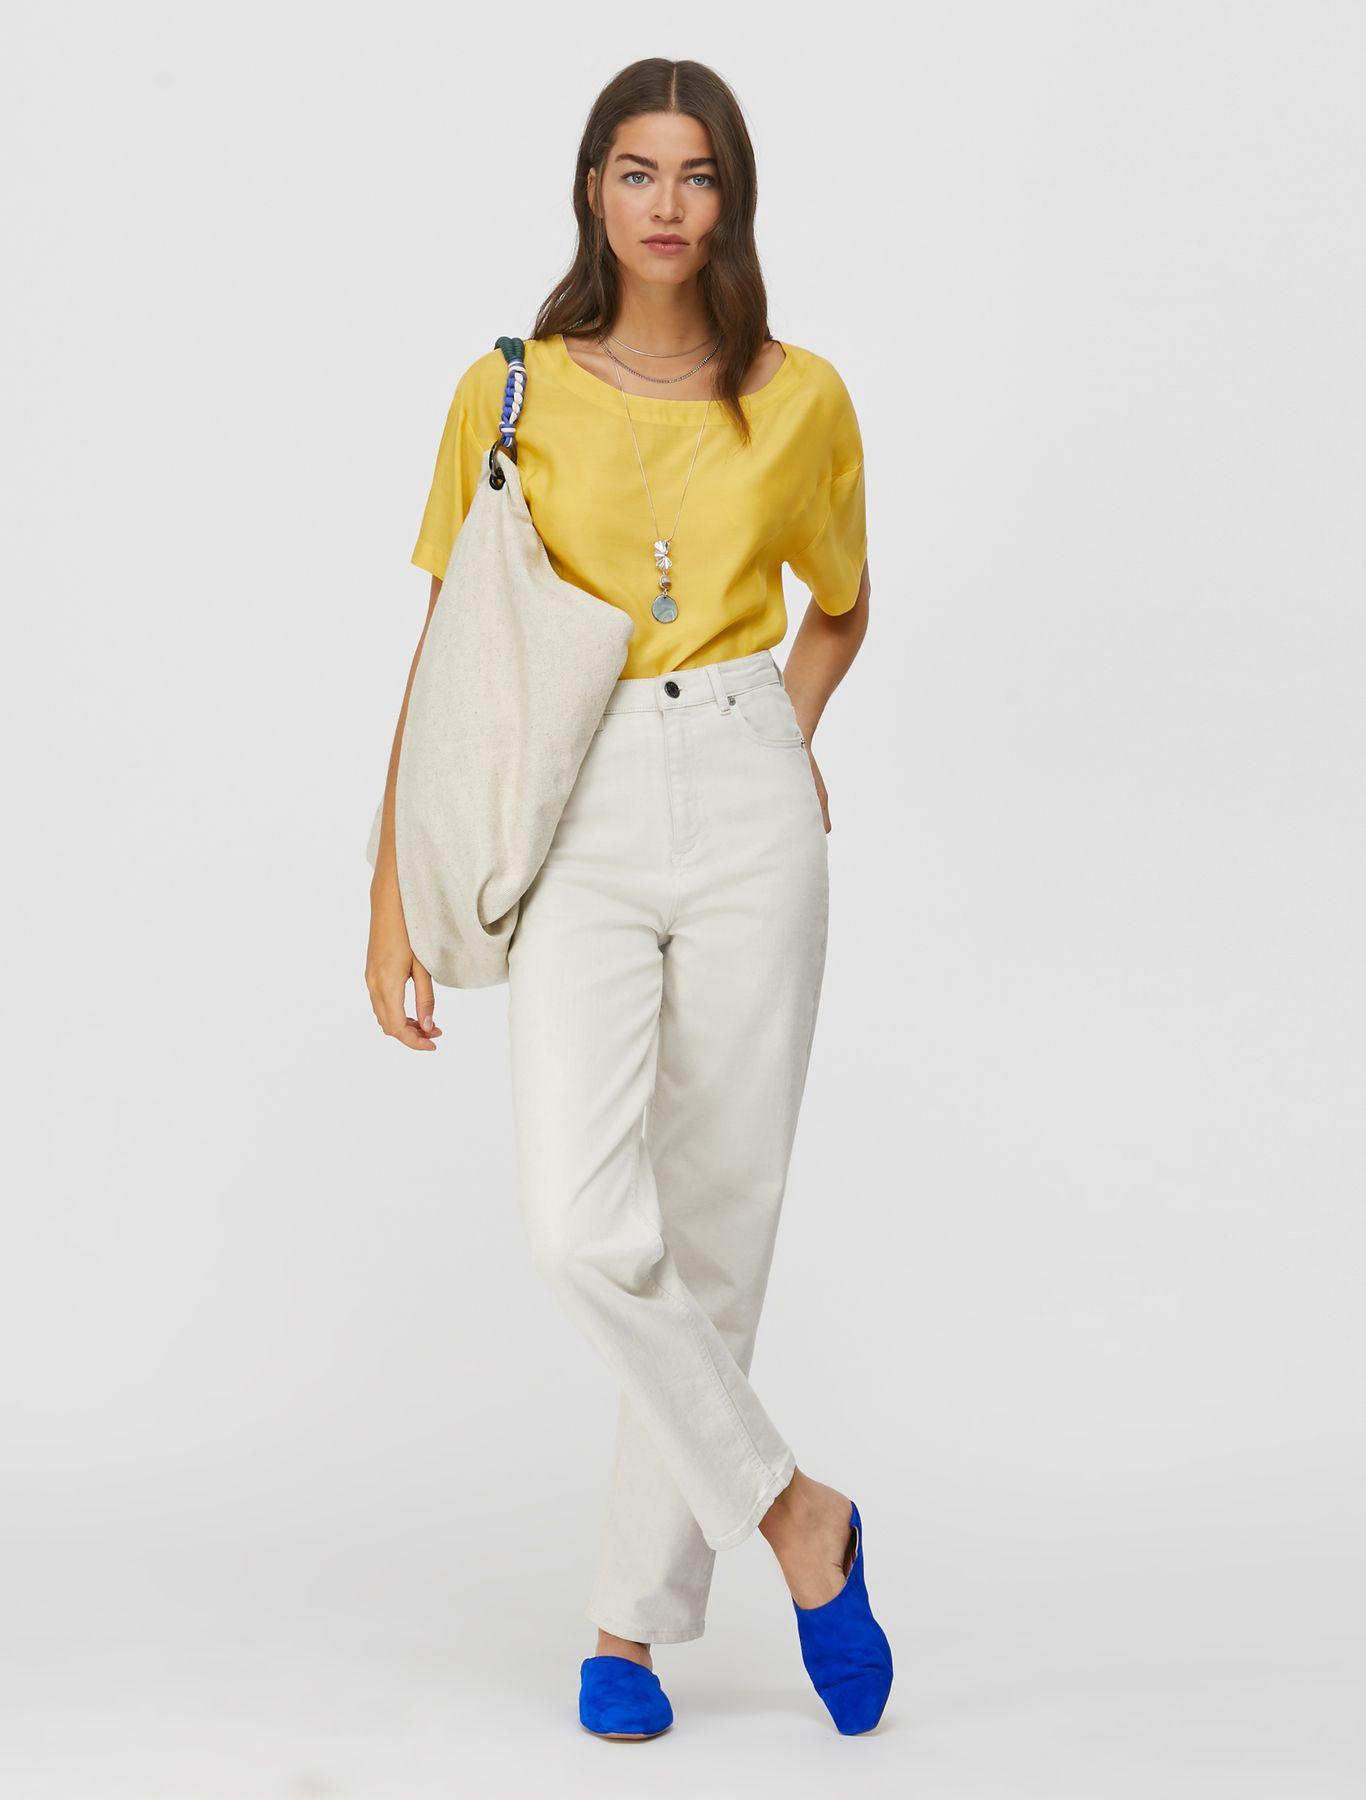 DISPENSA Shirt sunshine yellow 4